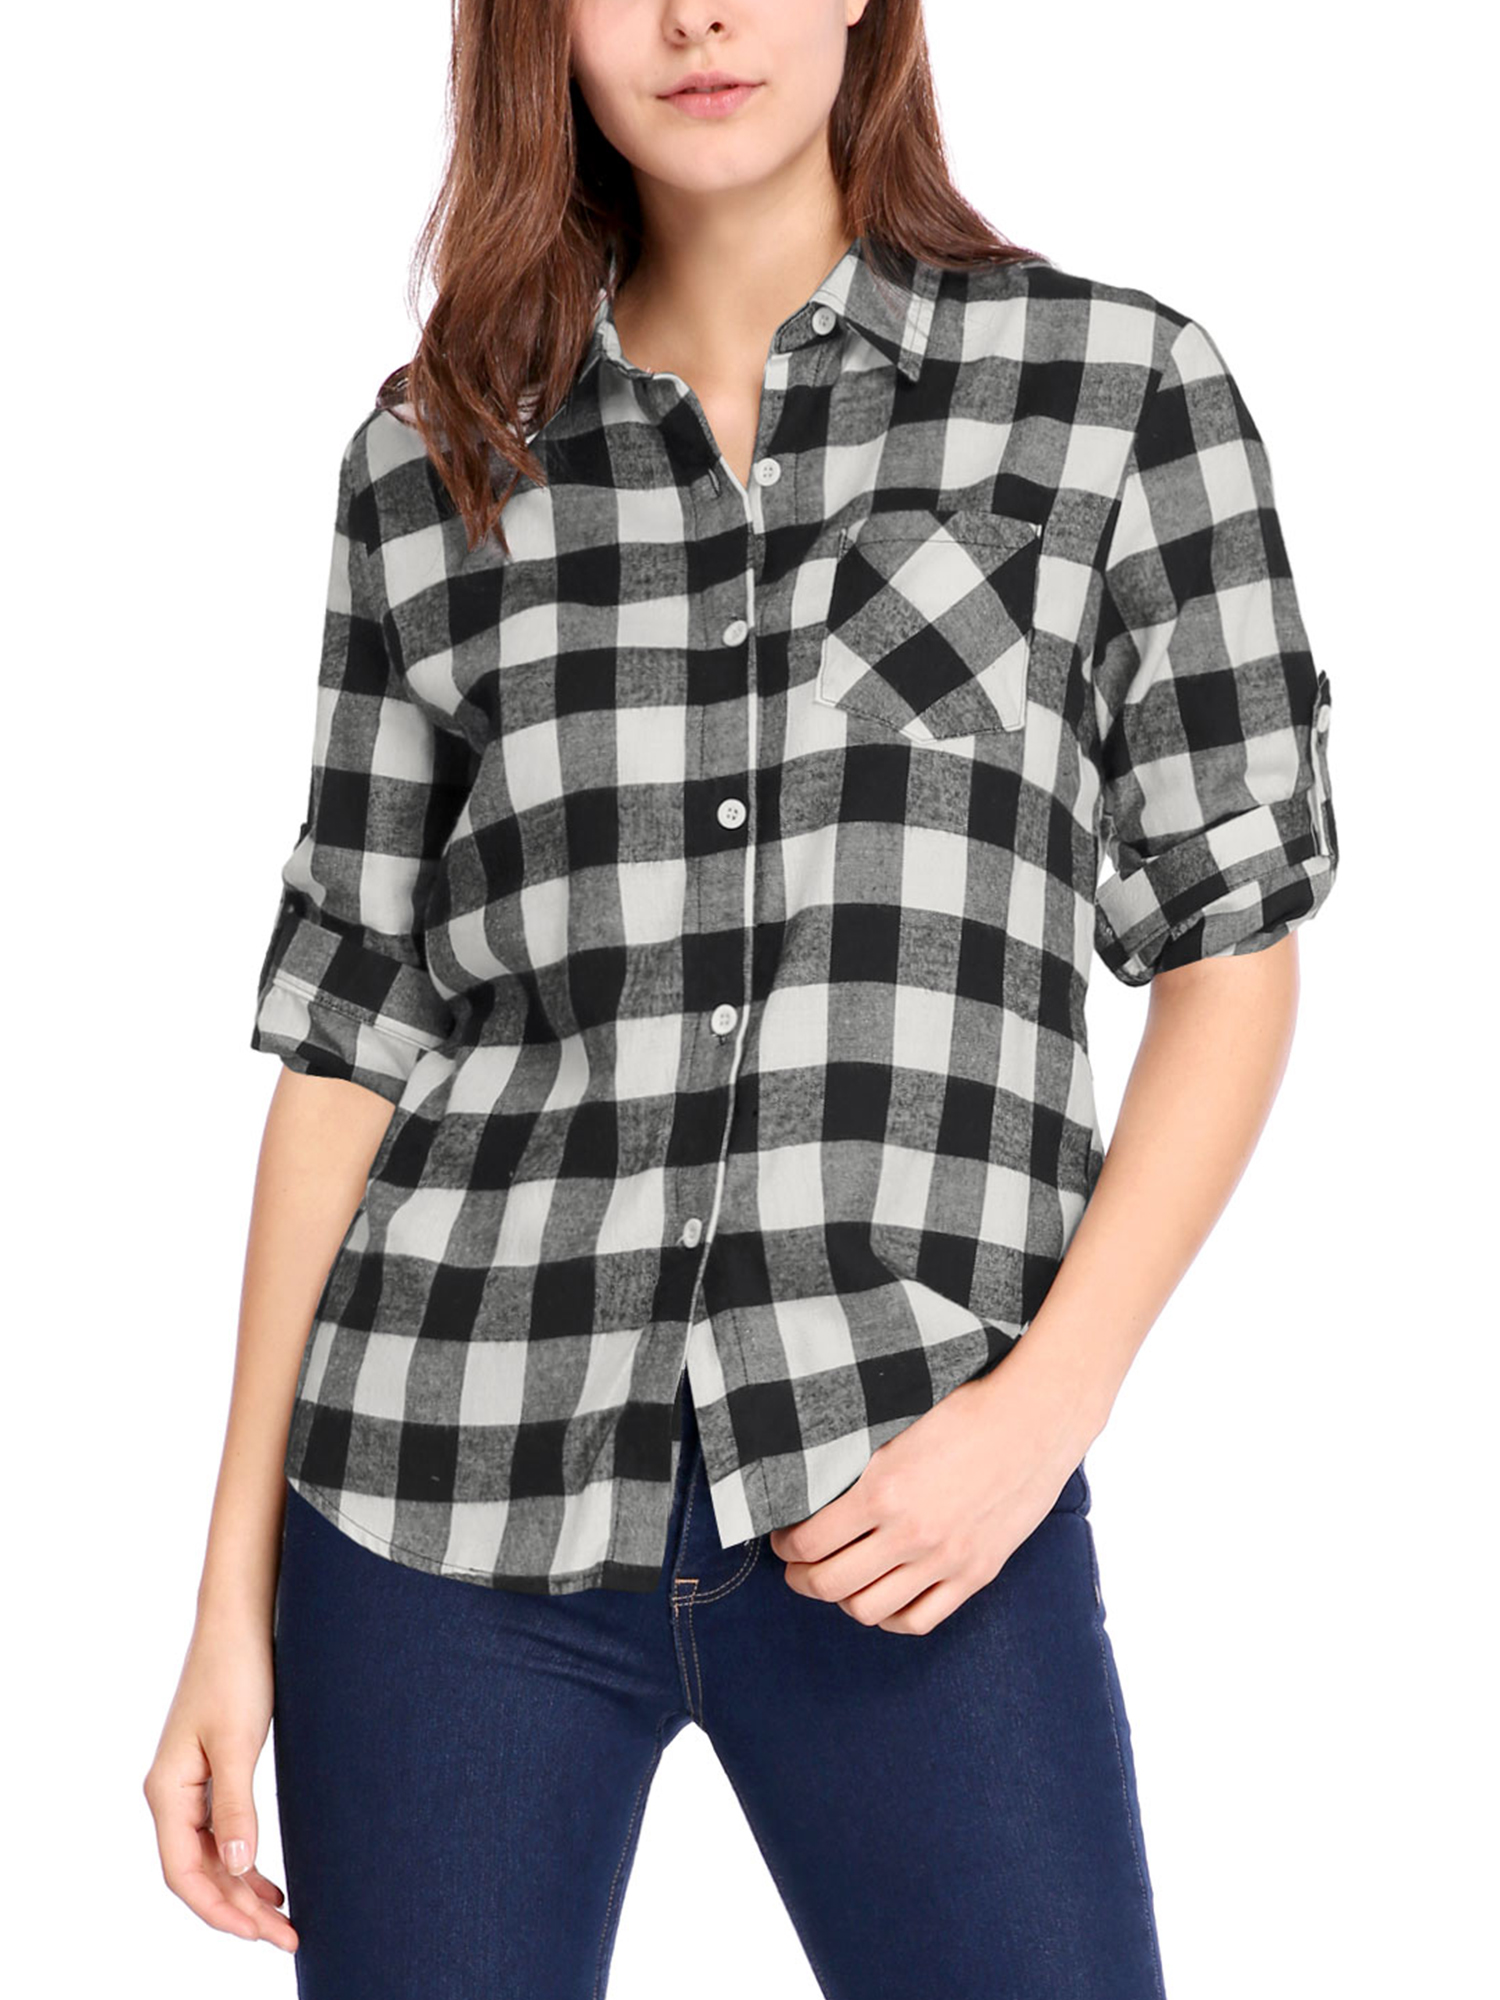 Ladies Button Down Long Sleeve Pocket Plaid Shirts White Black XL